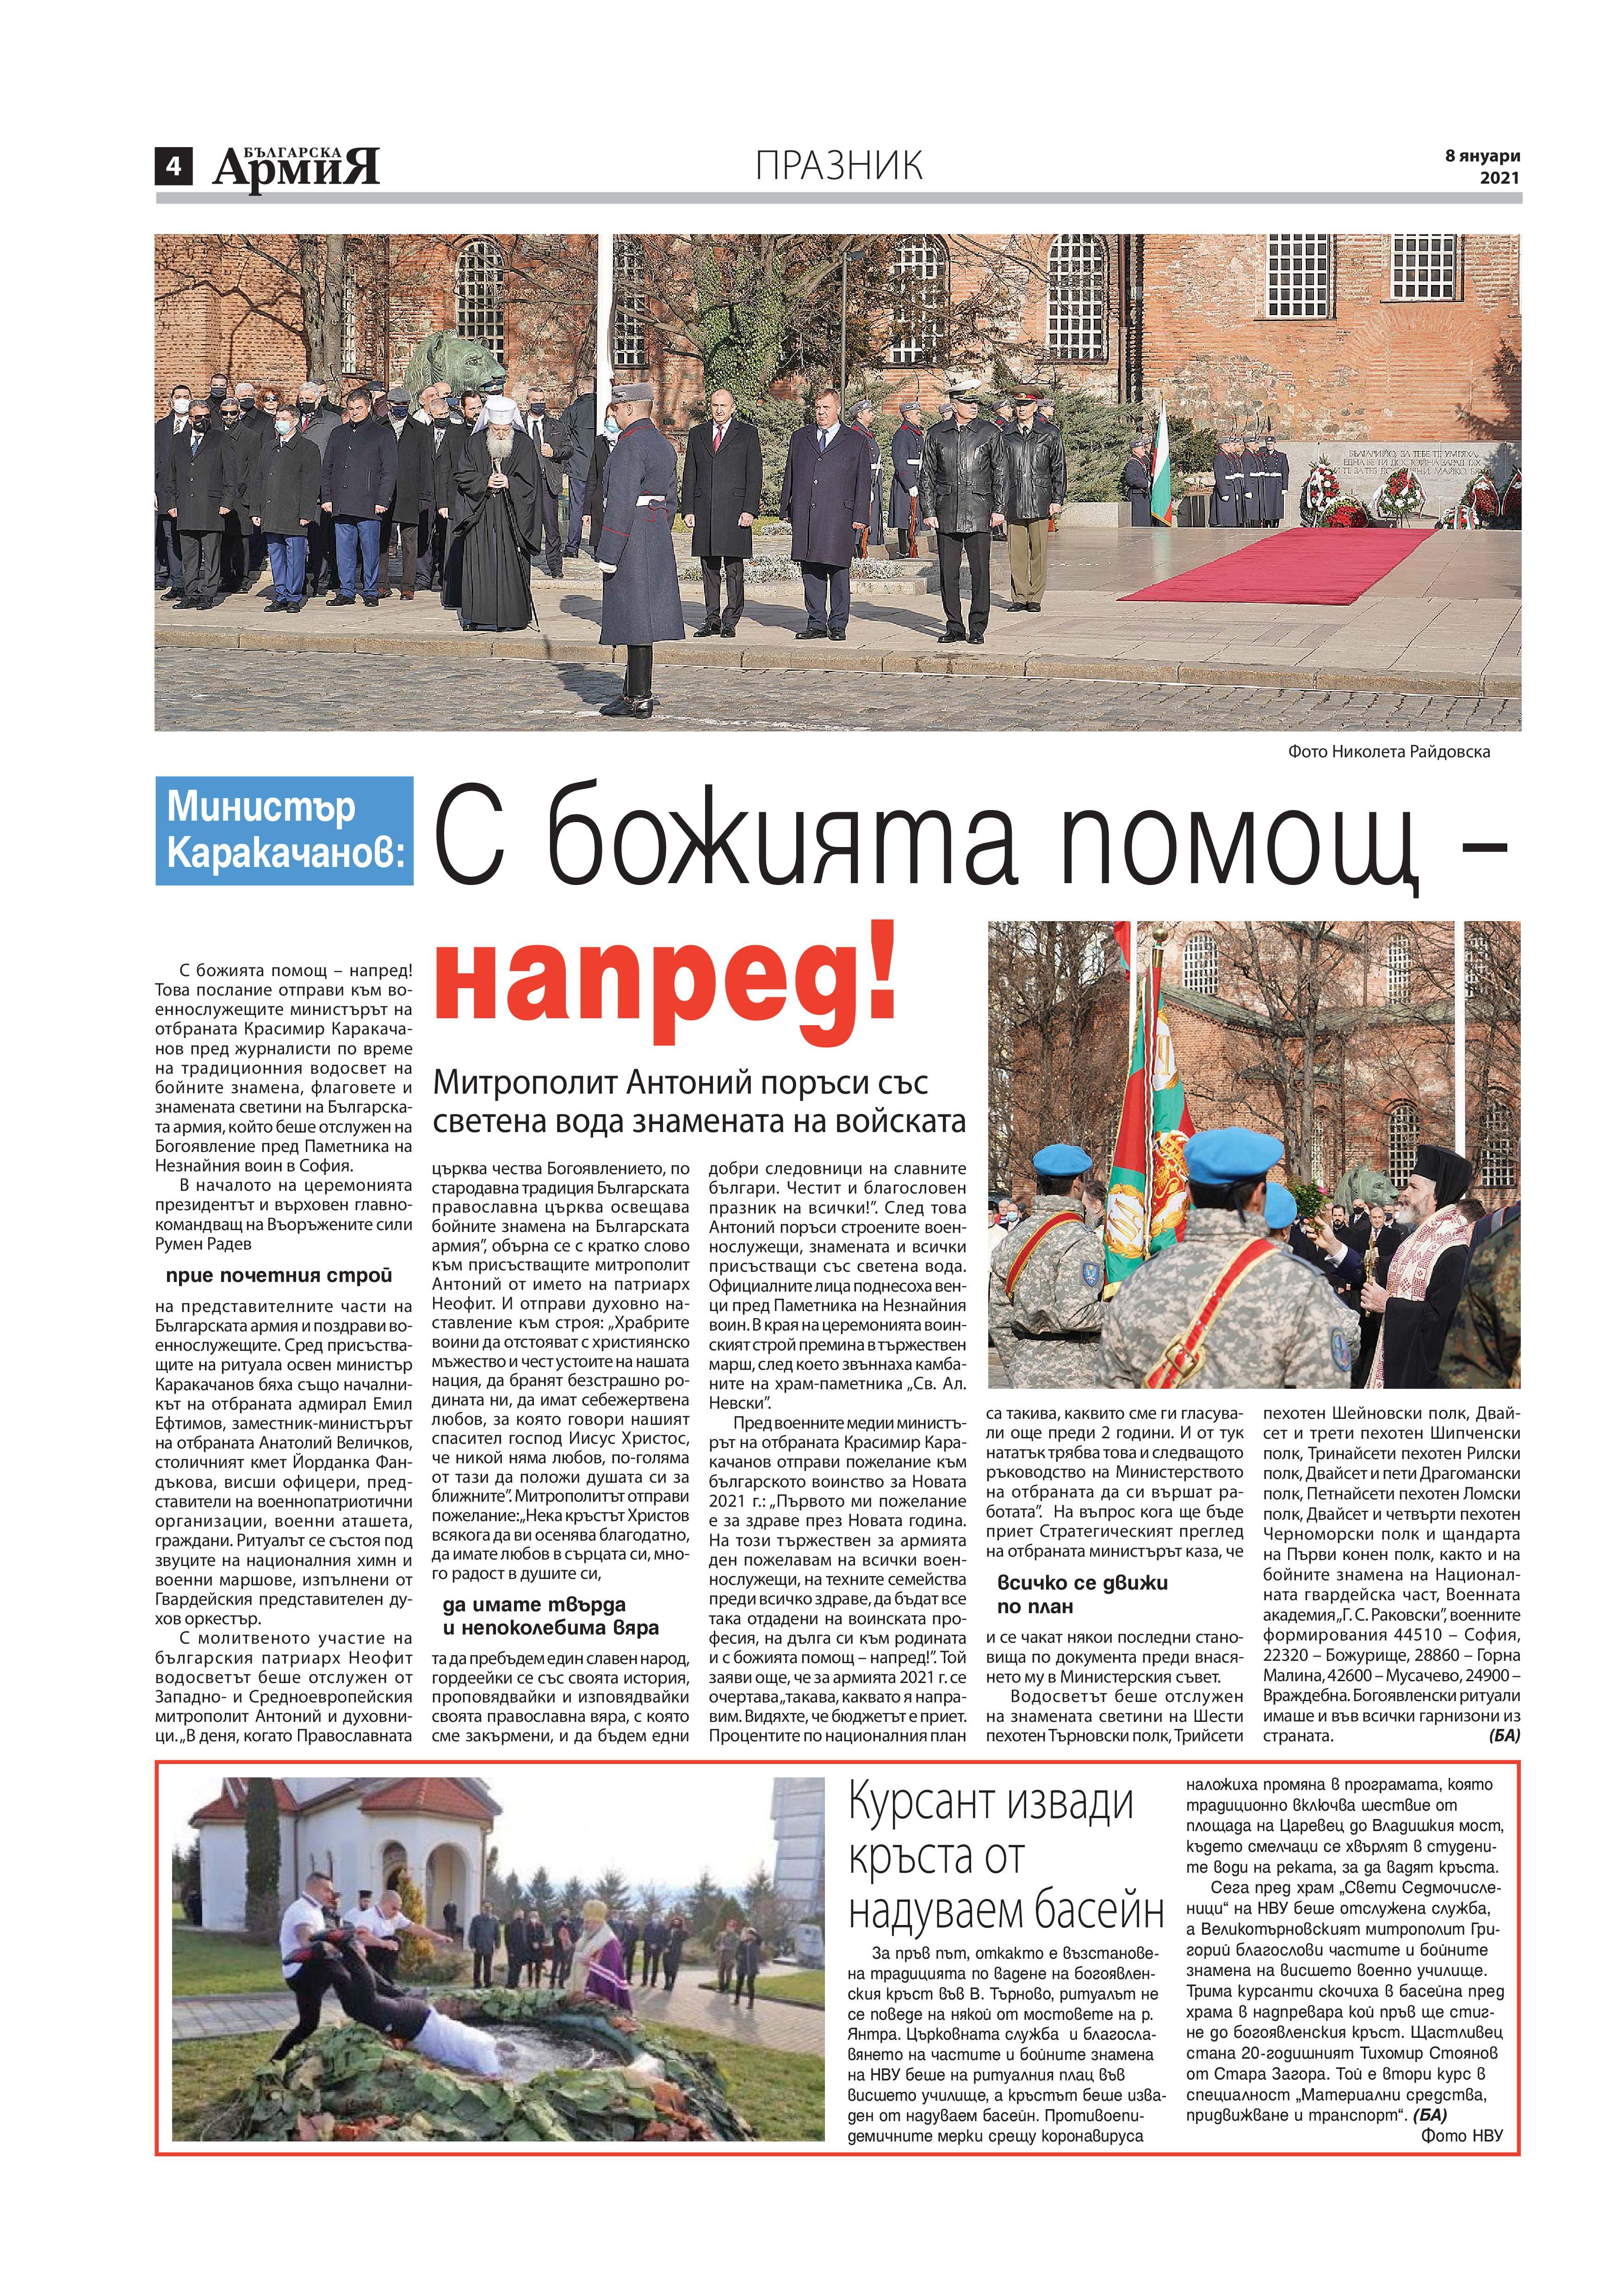 https://armymedia.bg/wp-content/uploads/2015/06/04-54.jpg